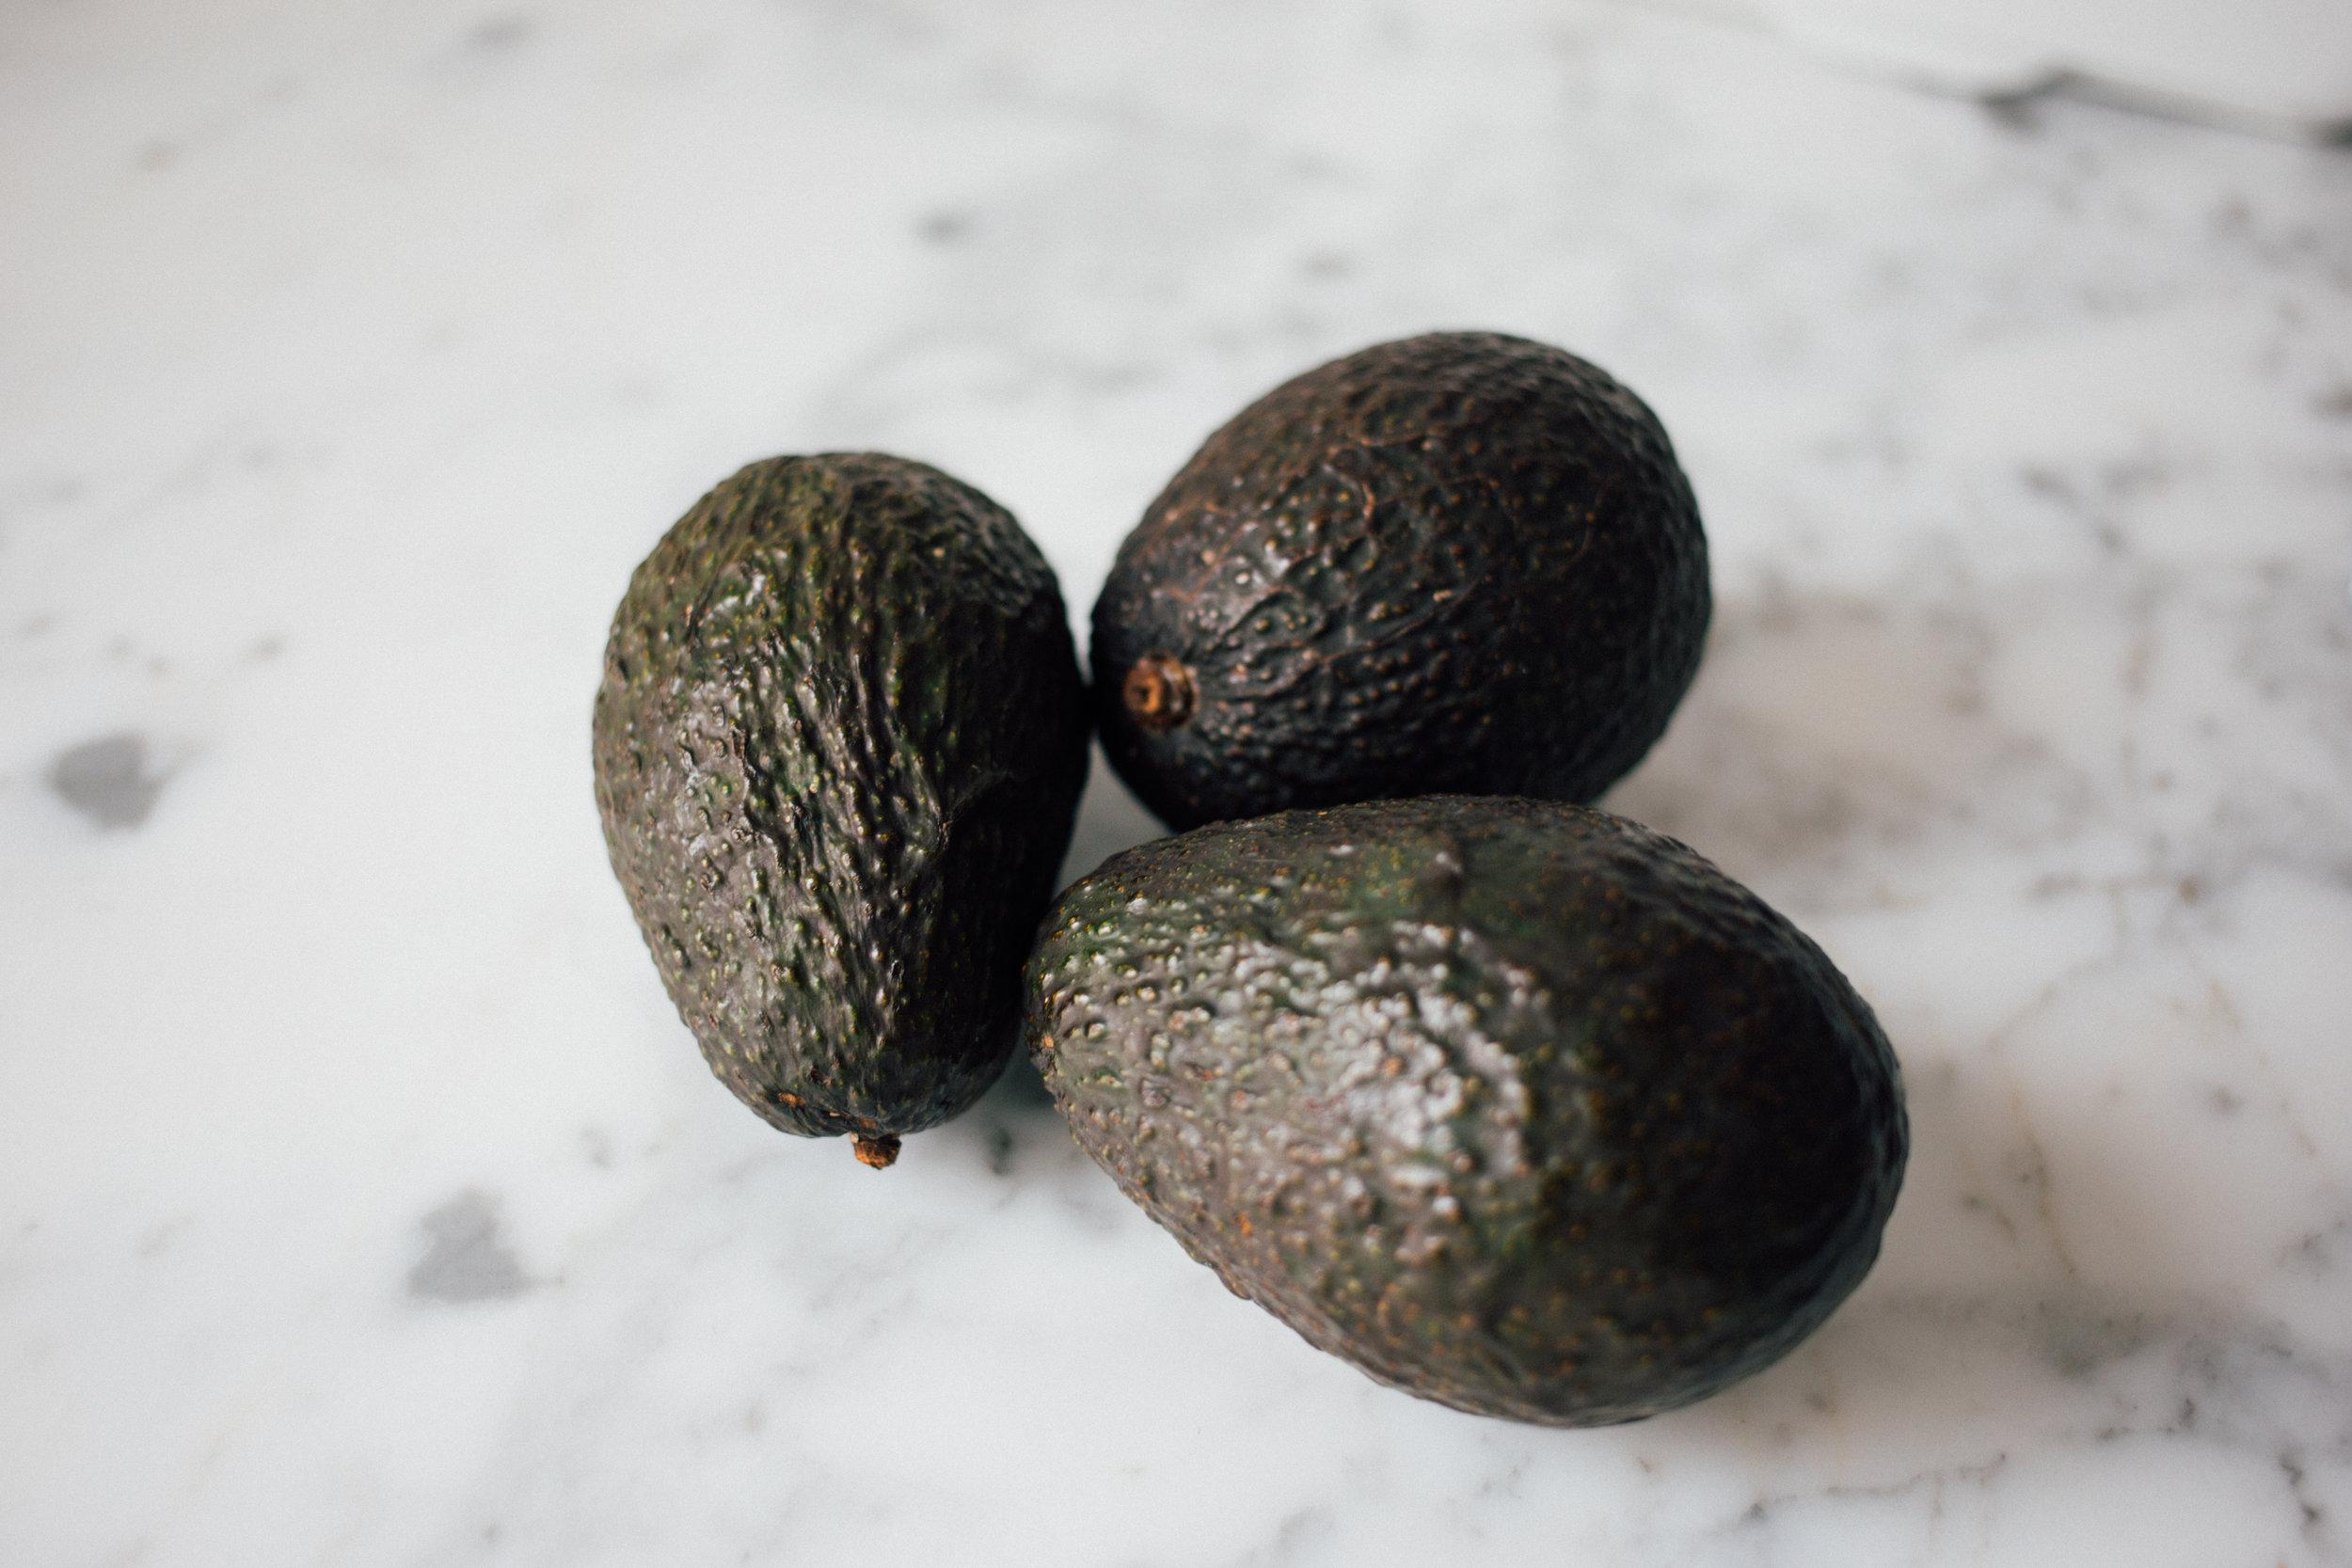 mr avocado - |Vegetarisch]Avocado / Mozzarella di Bufala DOP / Tomaten / Pinienkerne / Aceto di Modena DOP13,5€